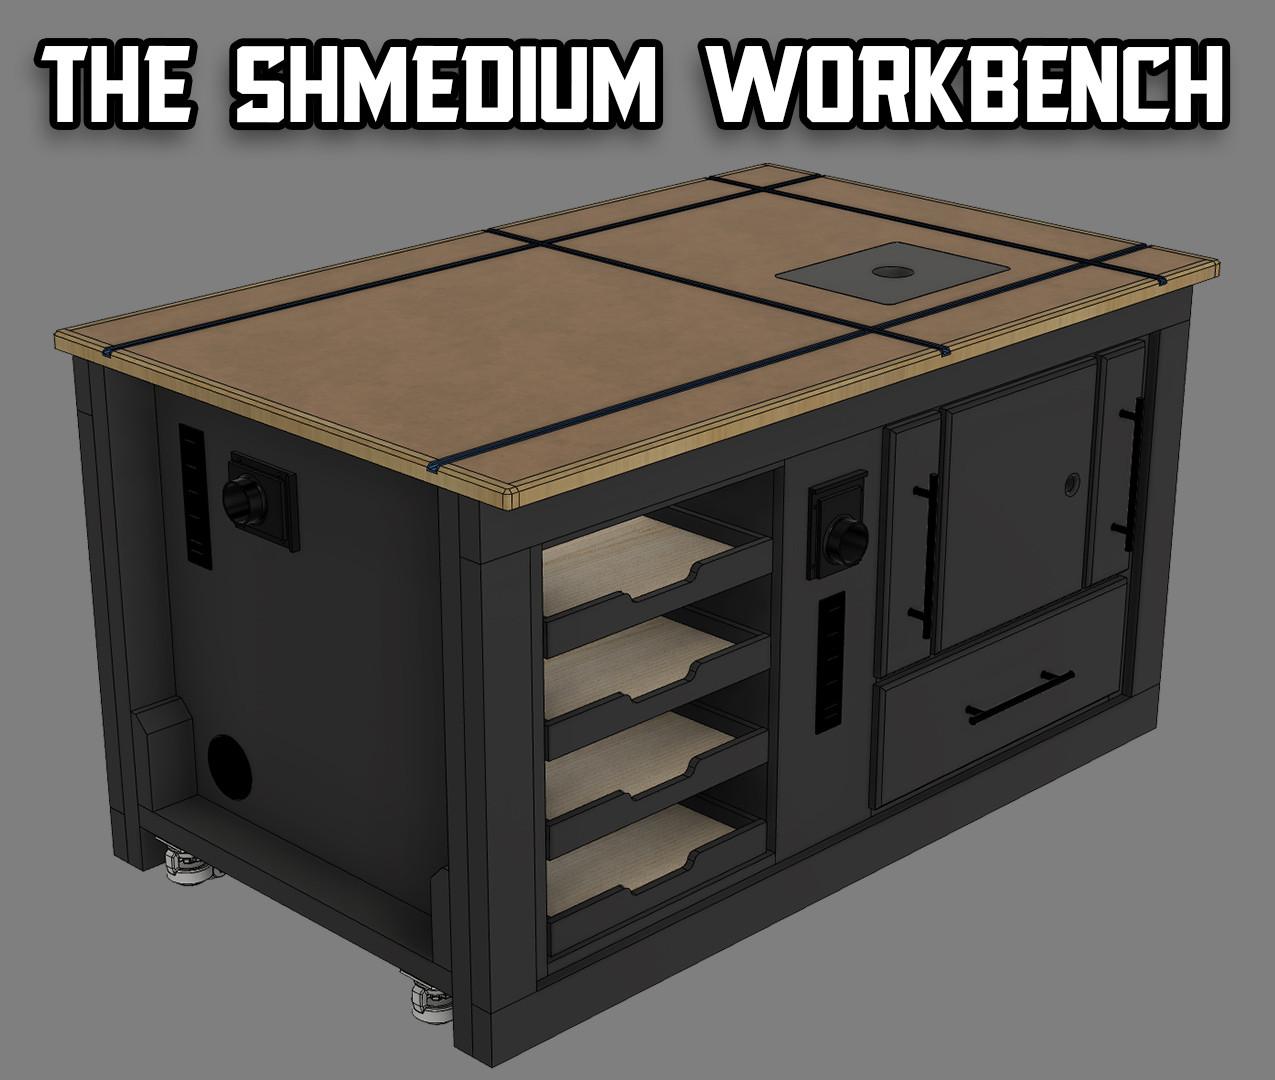 Shmedium Workbench Announcement2.jpg